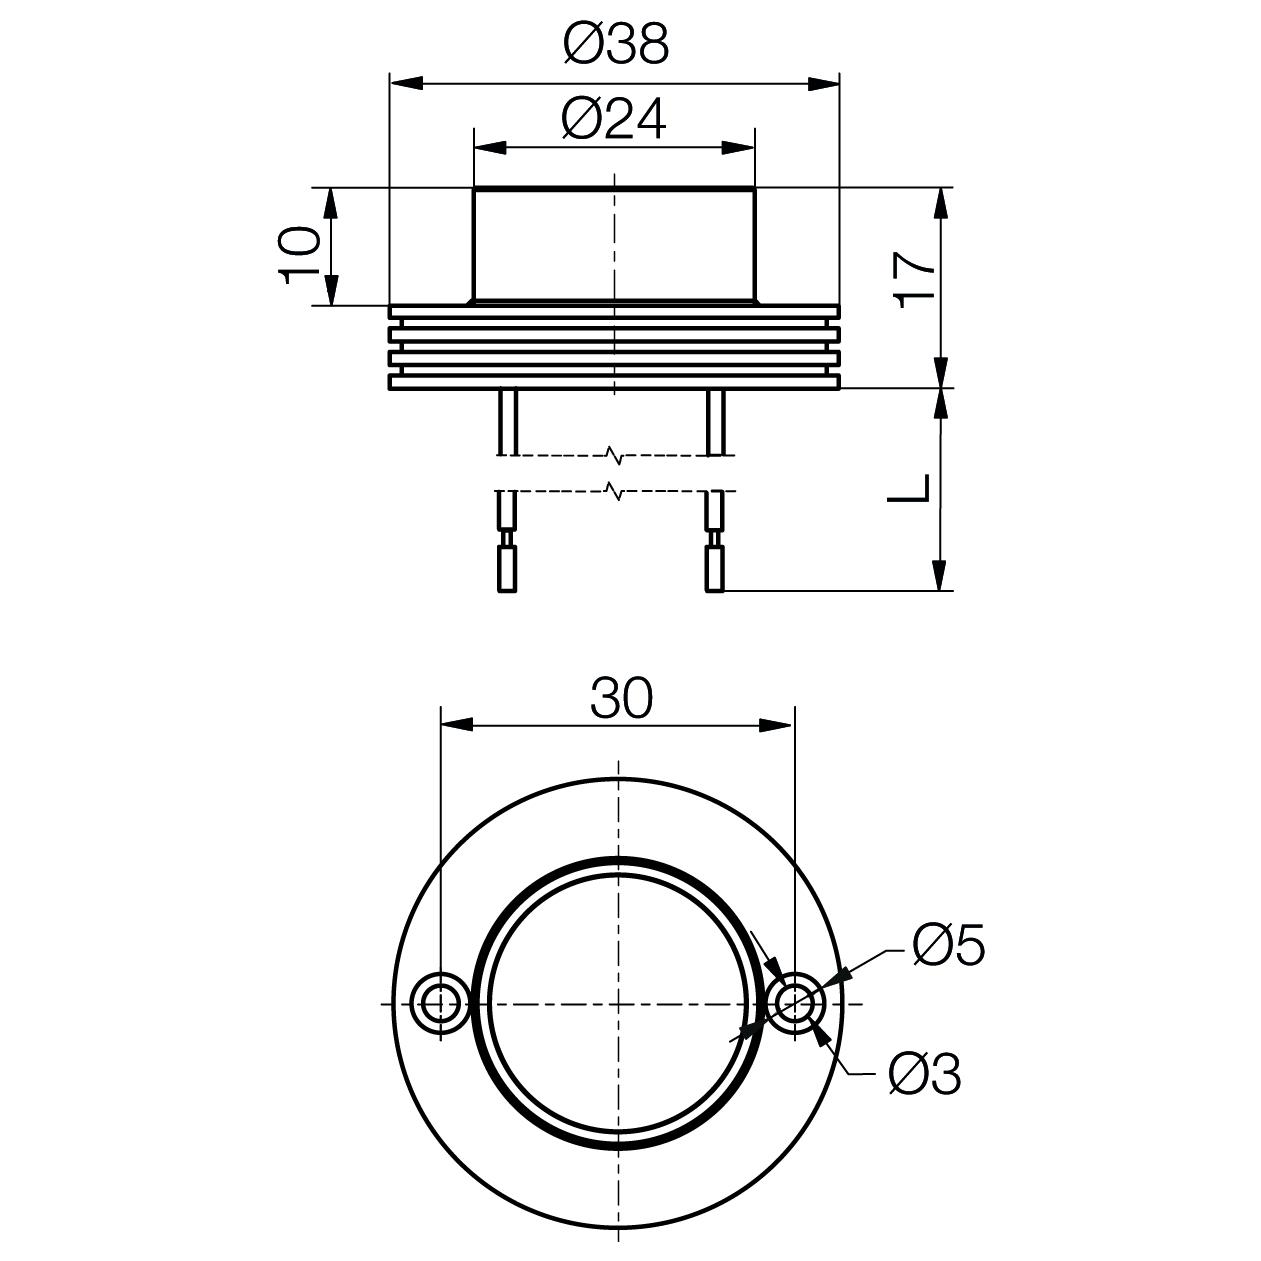 Power-LED-Modul MinoStar IP67 - plan